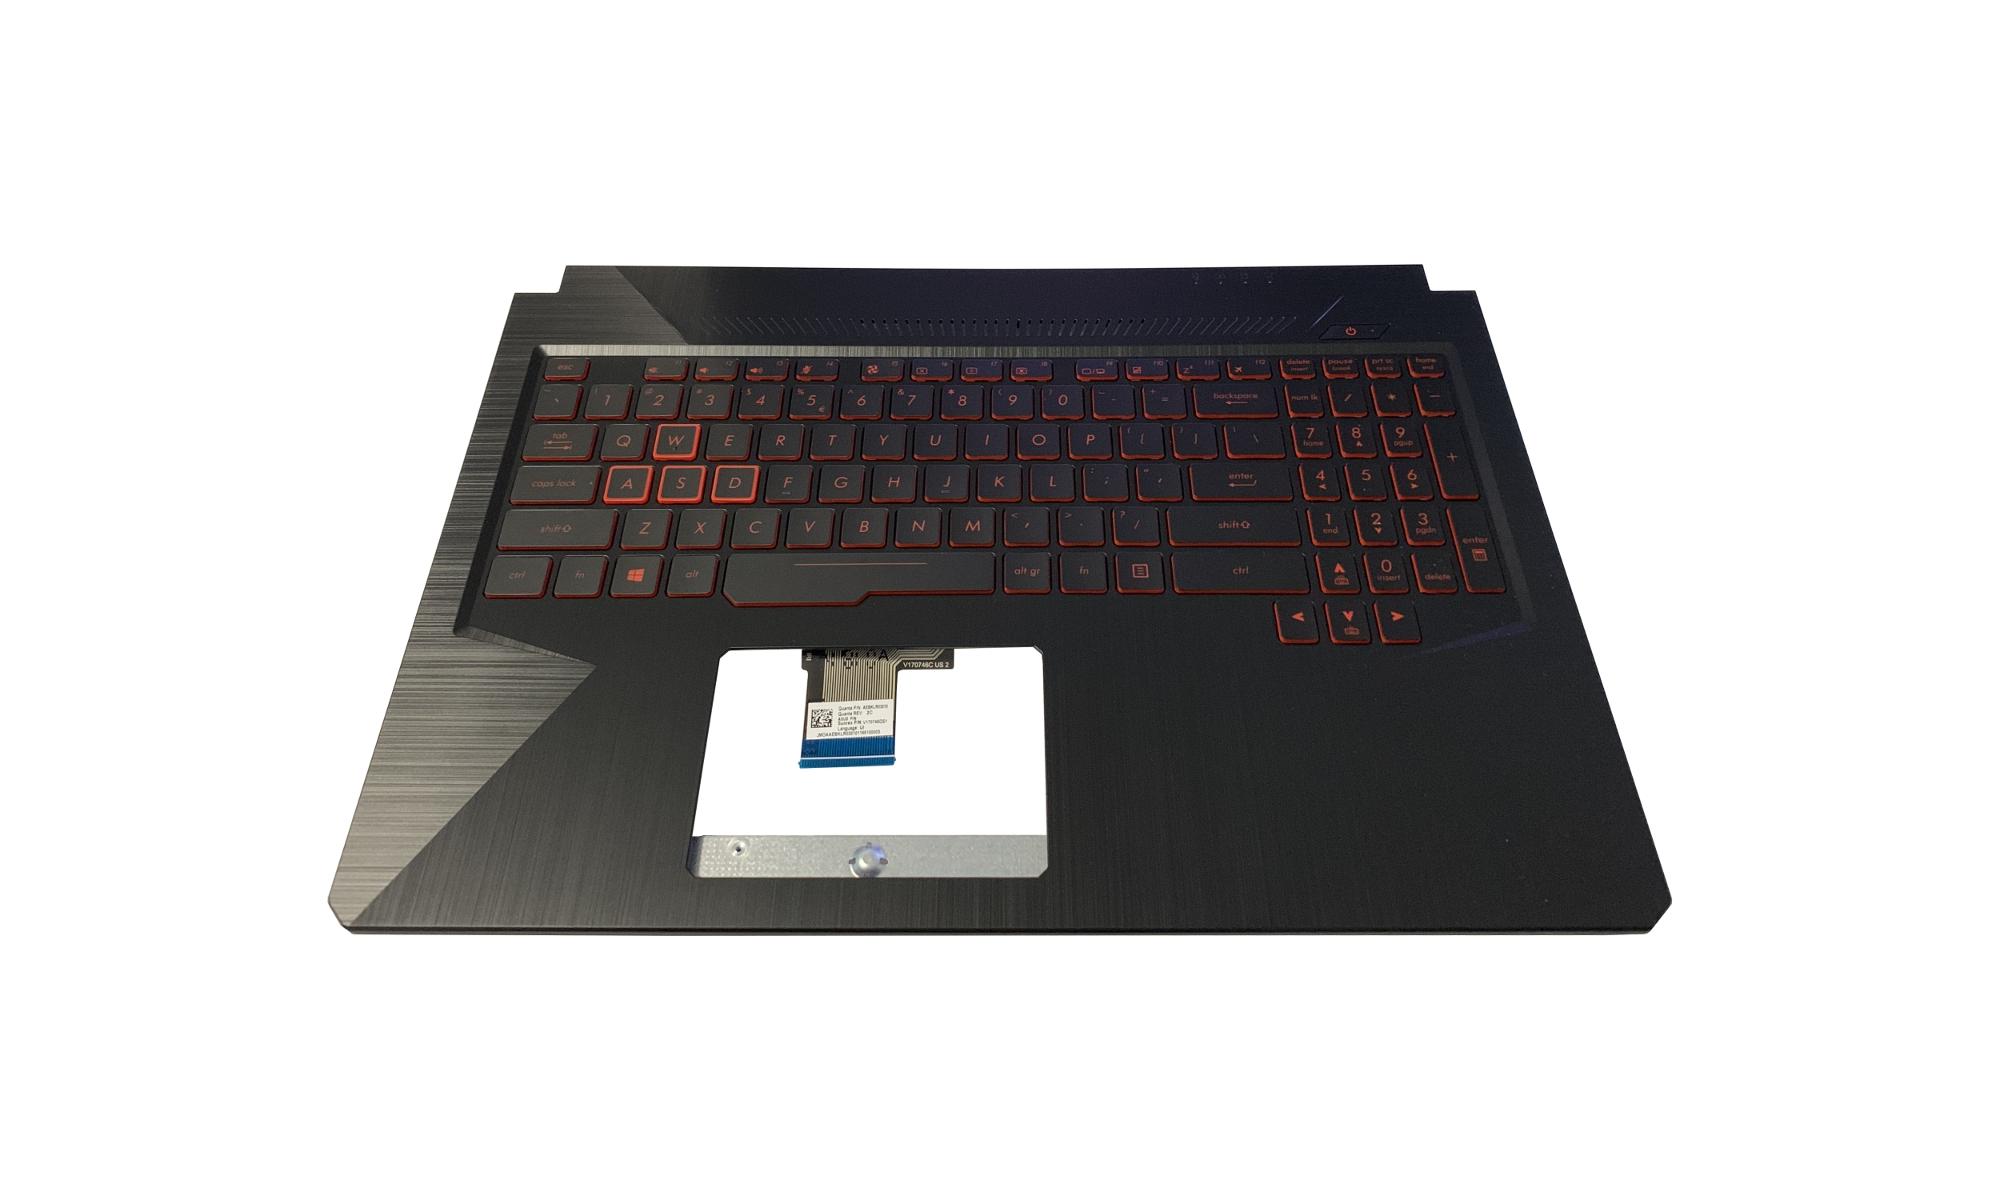 Carcasa superioara si tastatura originala Asus TUF FX504GM, layout US, cu iluminare